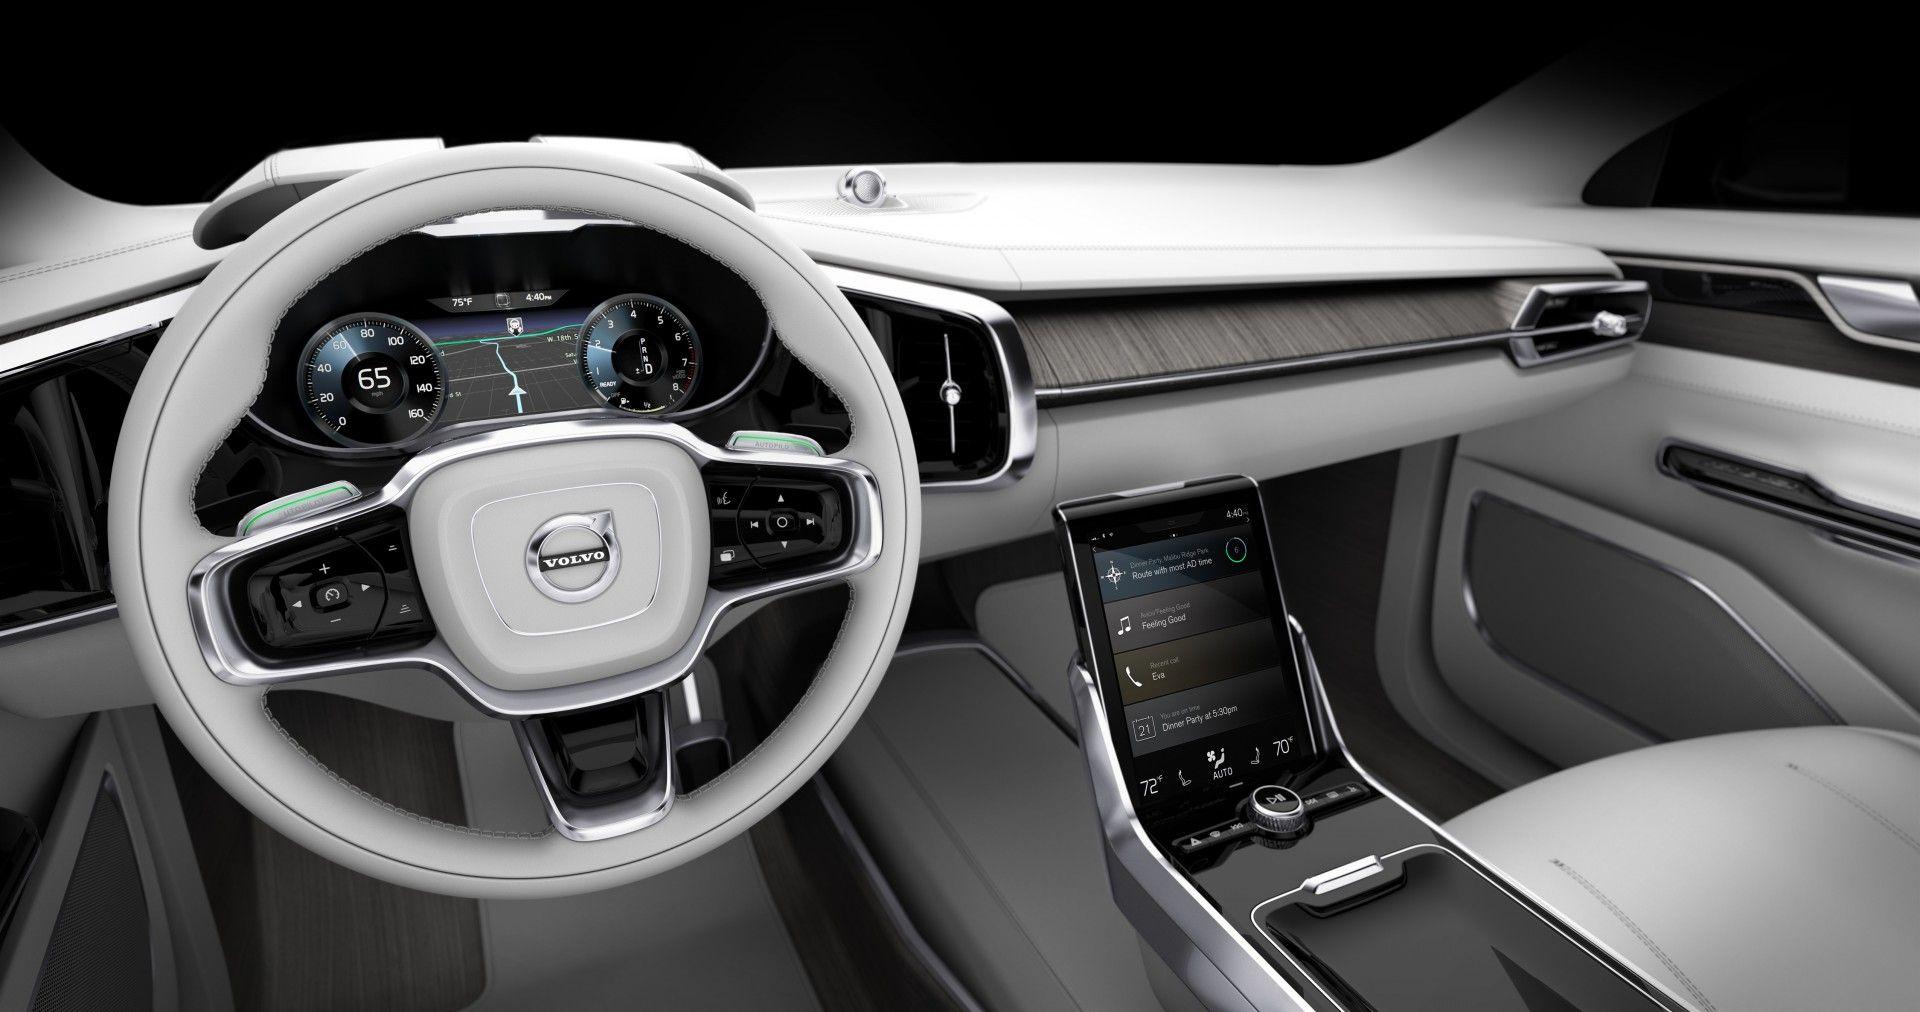 volvo-concept-fahrt-im-auto-interieur   Driverless Car   Pinterest ...